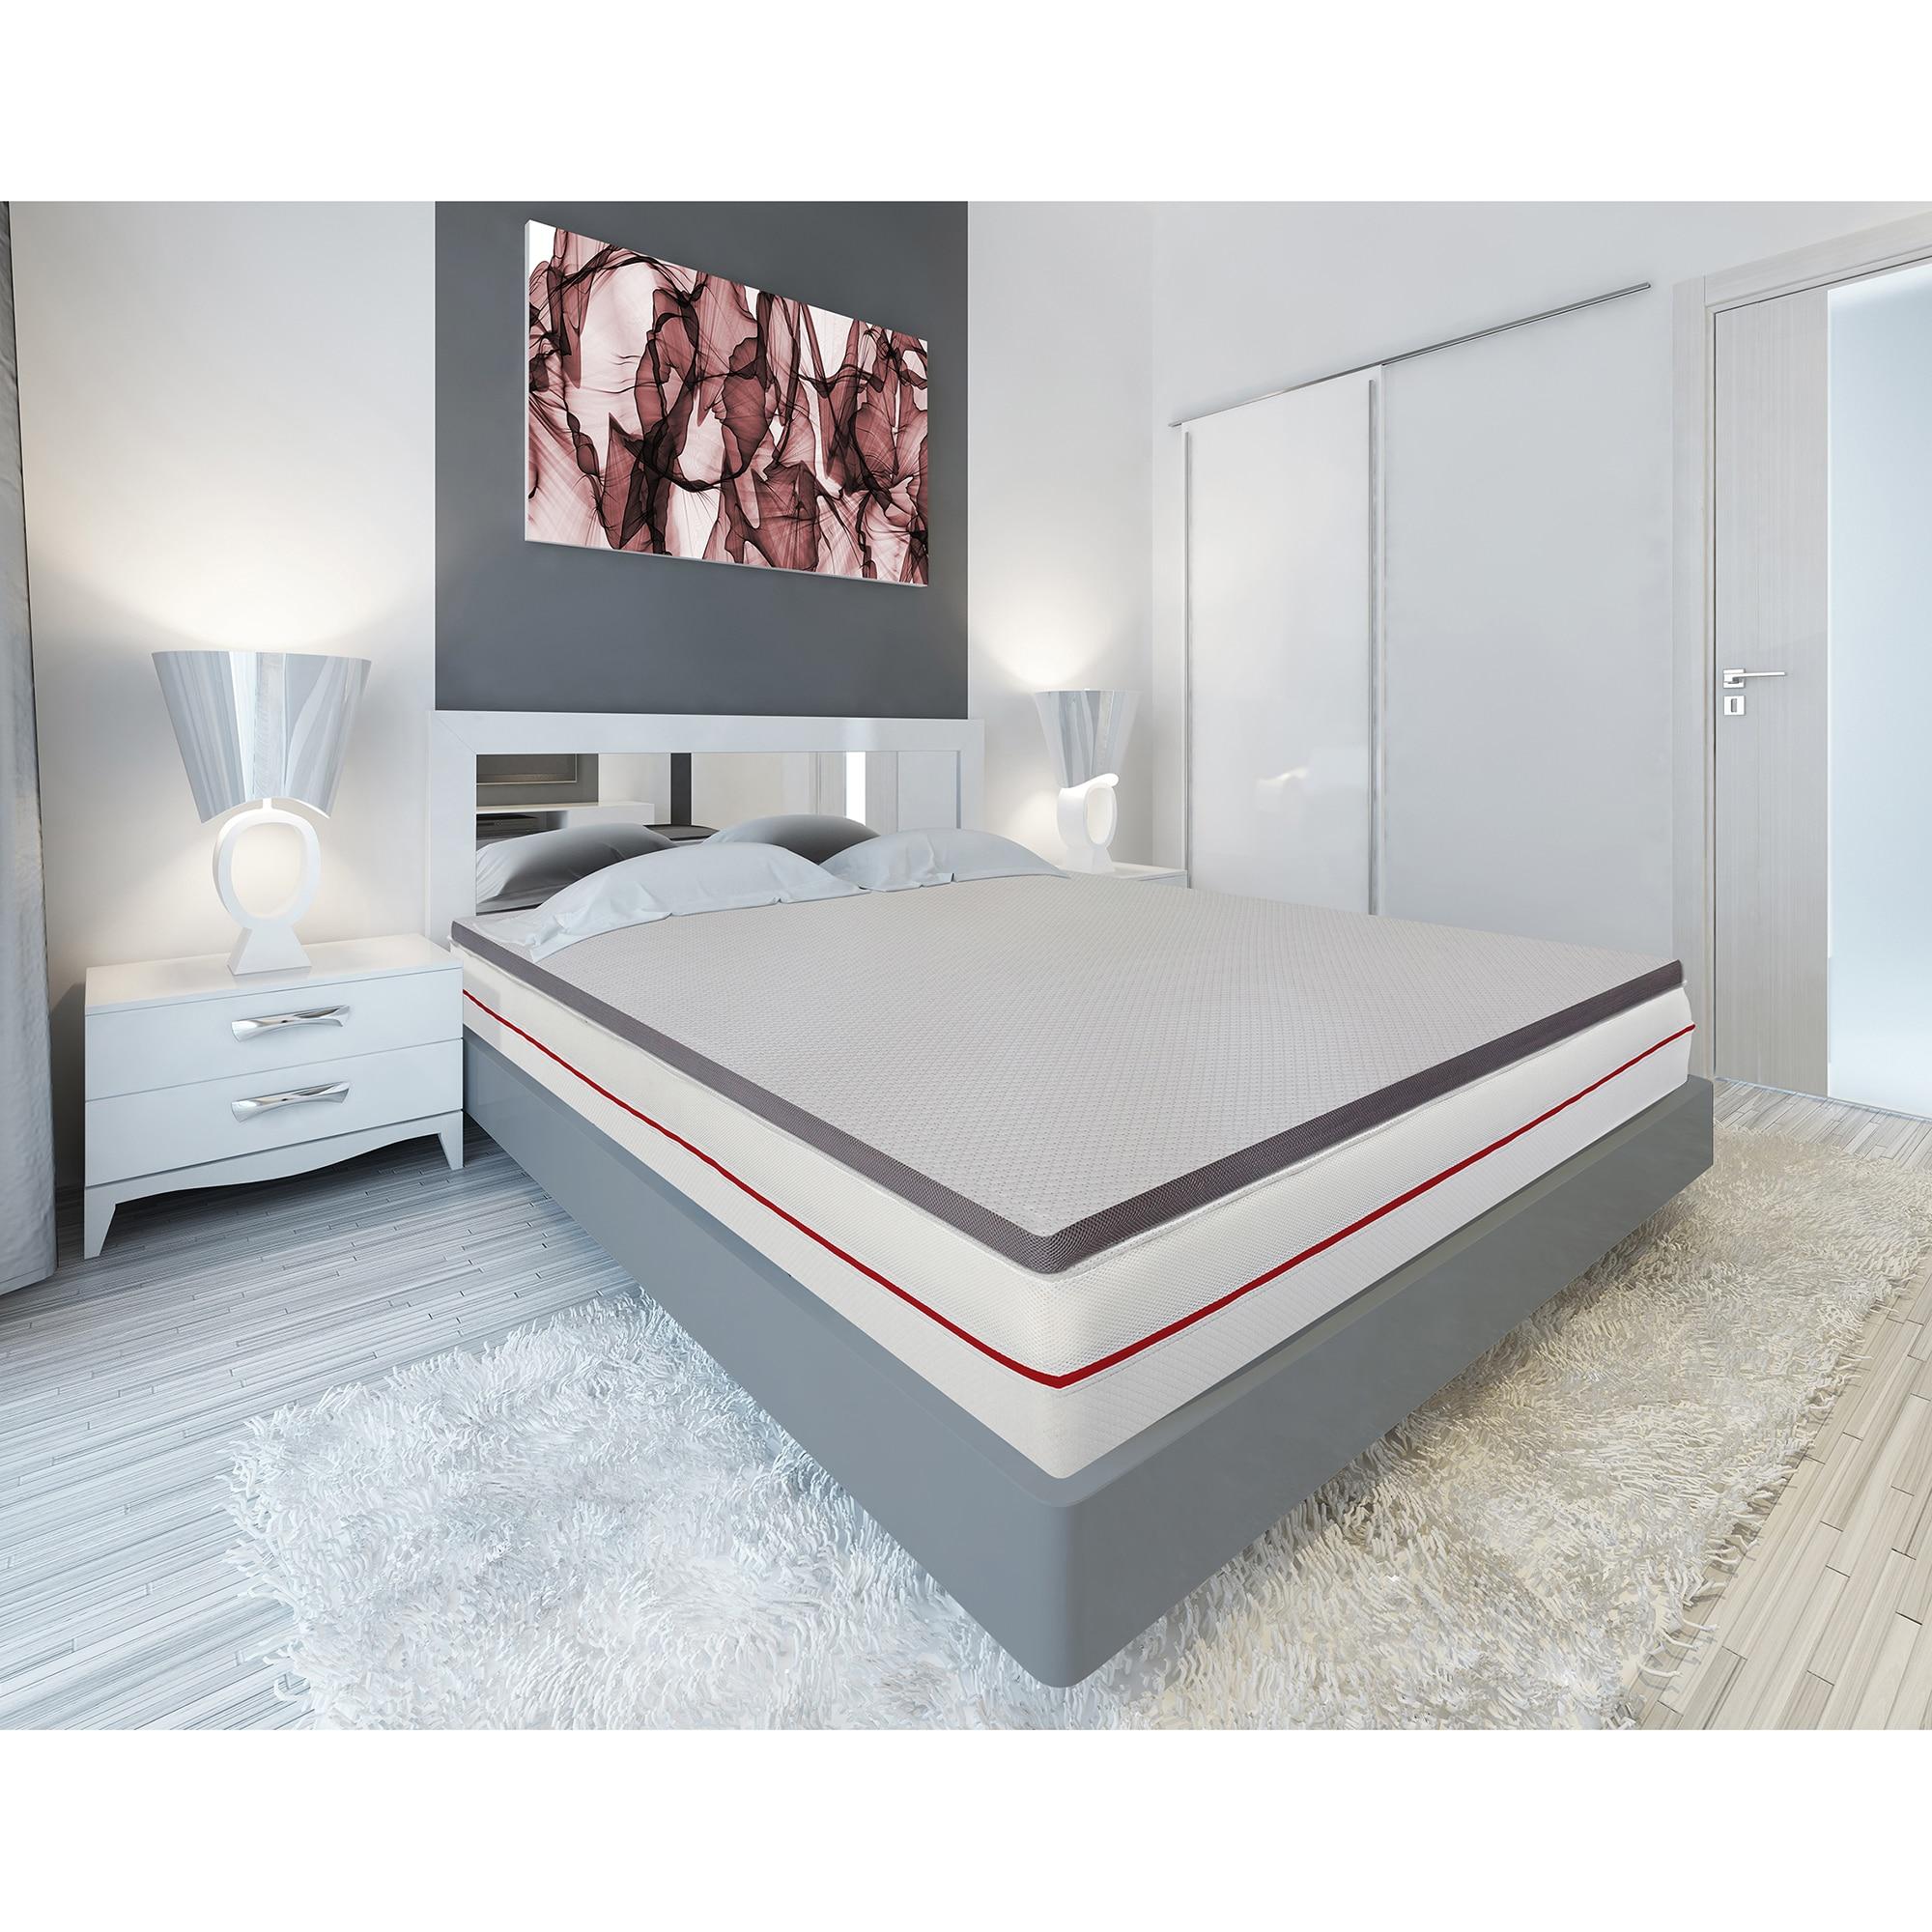 Fotografie Topper saltea Kring Luxury, H 8 cm spuma memory, 140x200 cm